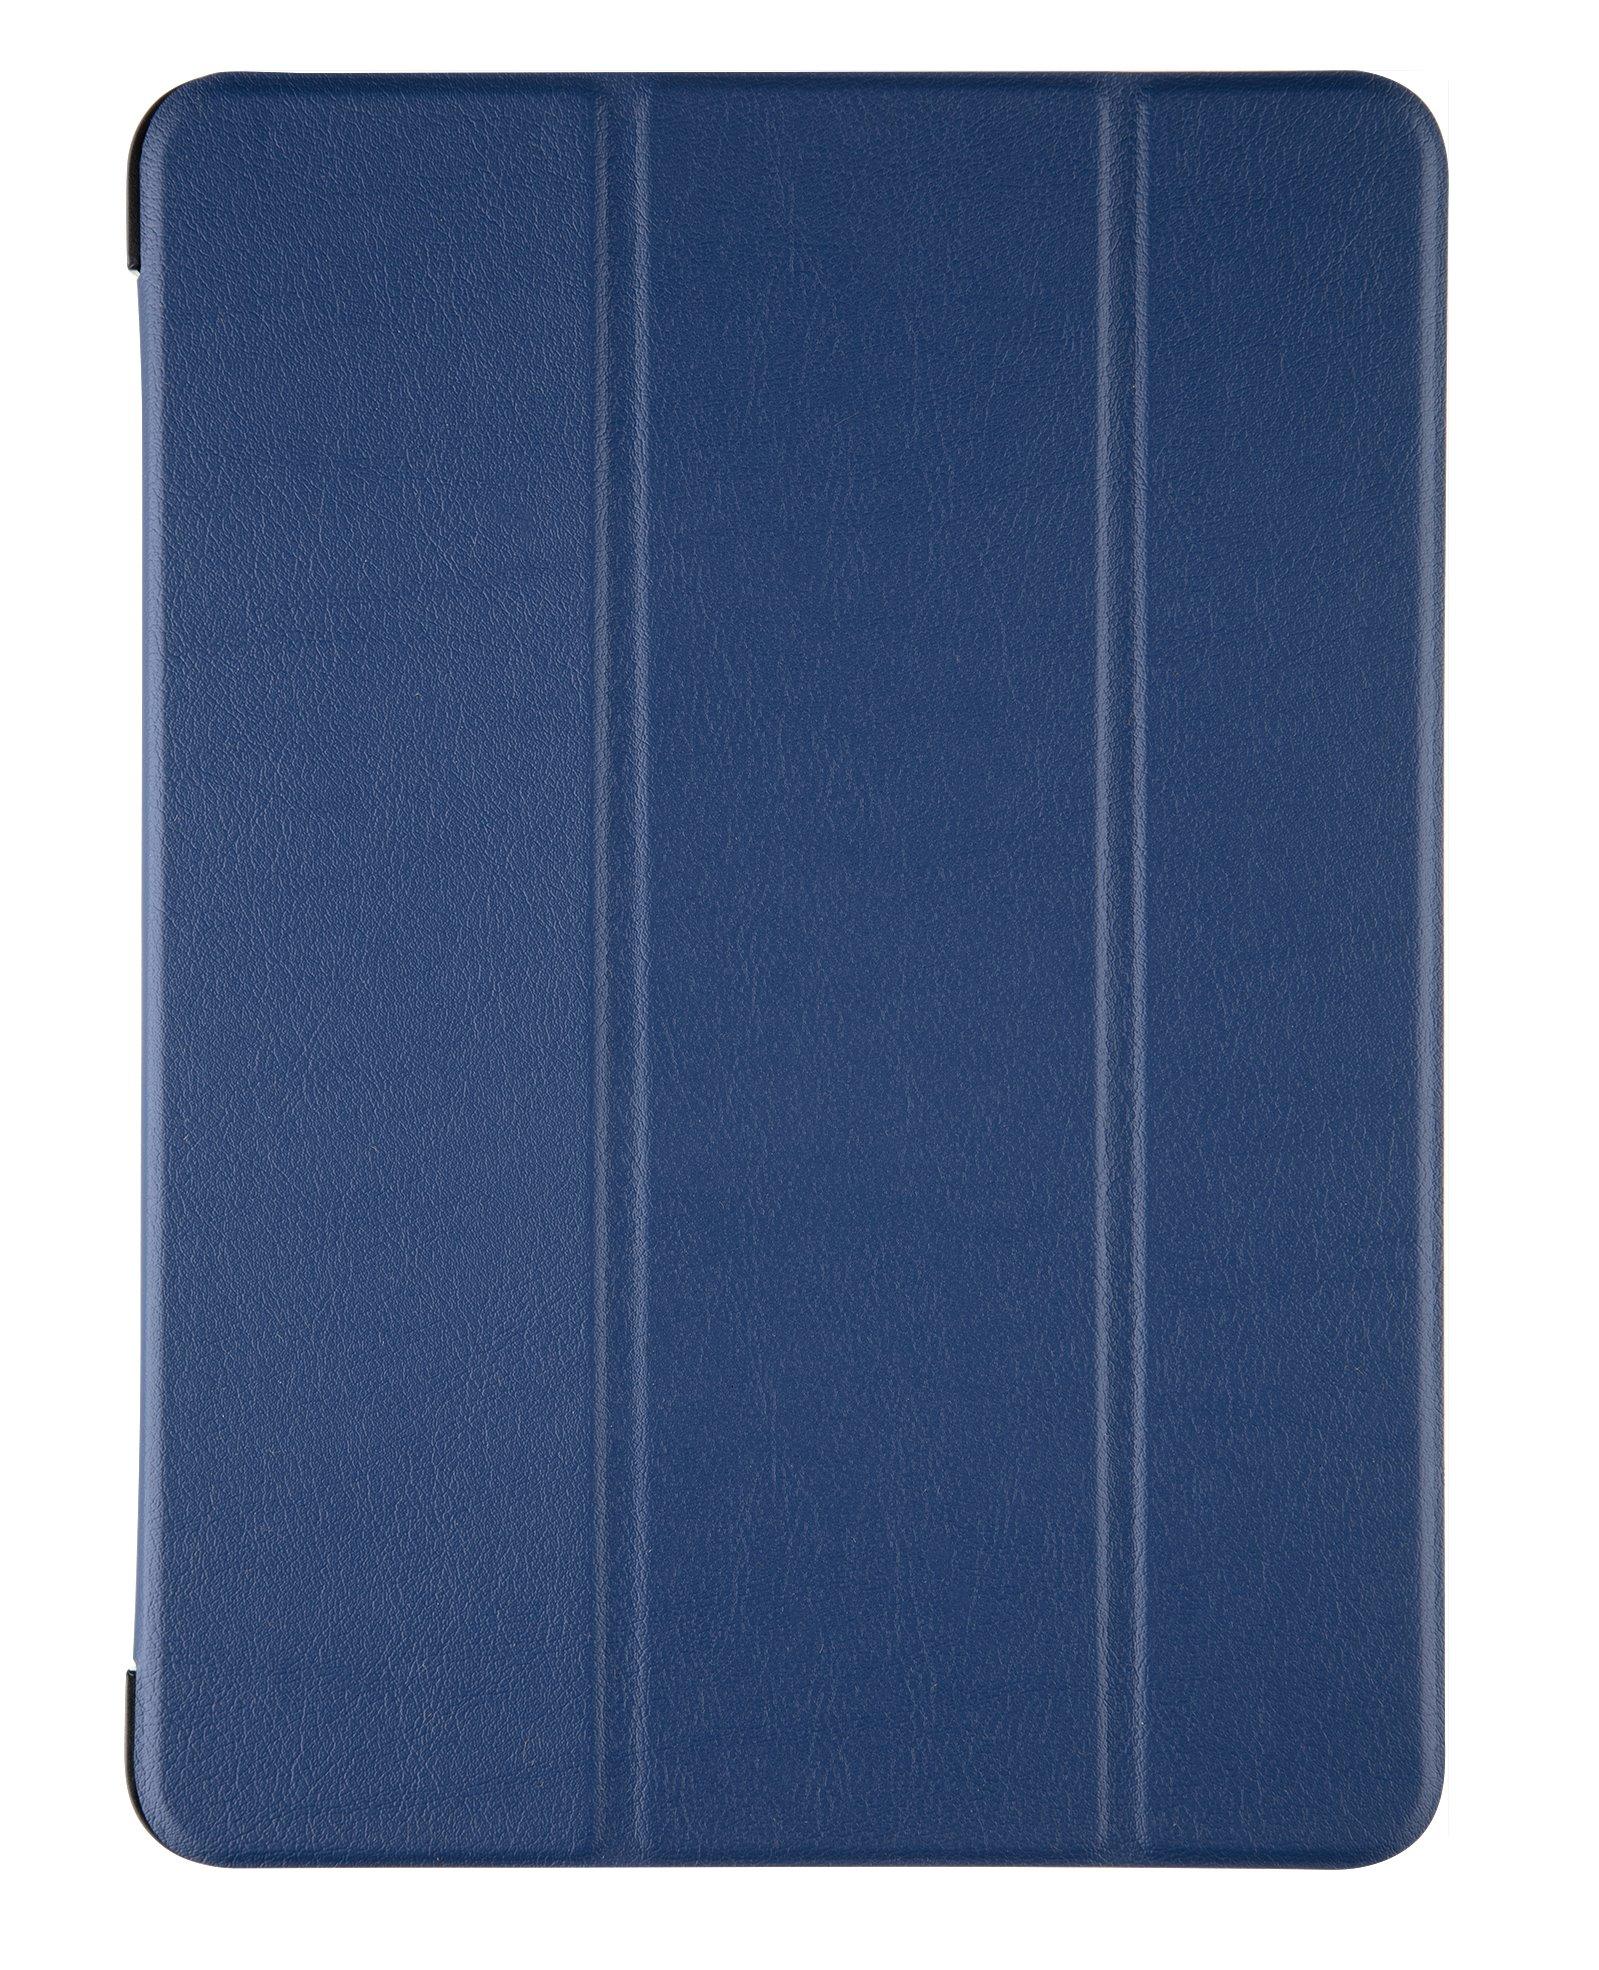 Tactical Book Tri Fold Pouzdro pro Samsung T220/T225 Galaxy Tab A7 Lite 8.7 Blue 8596311153365